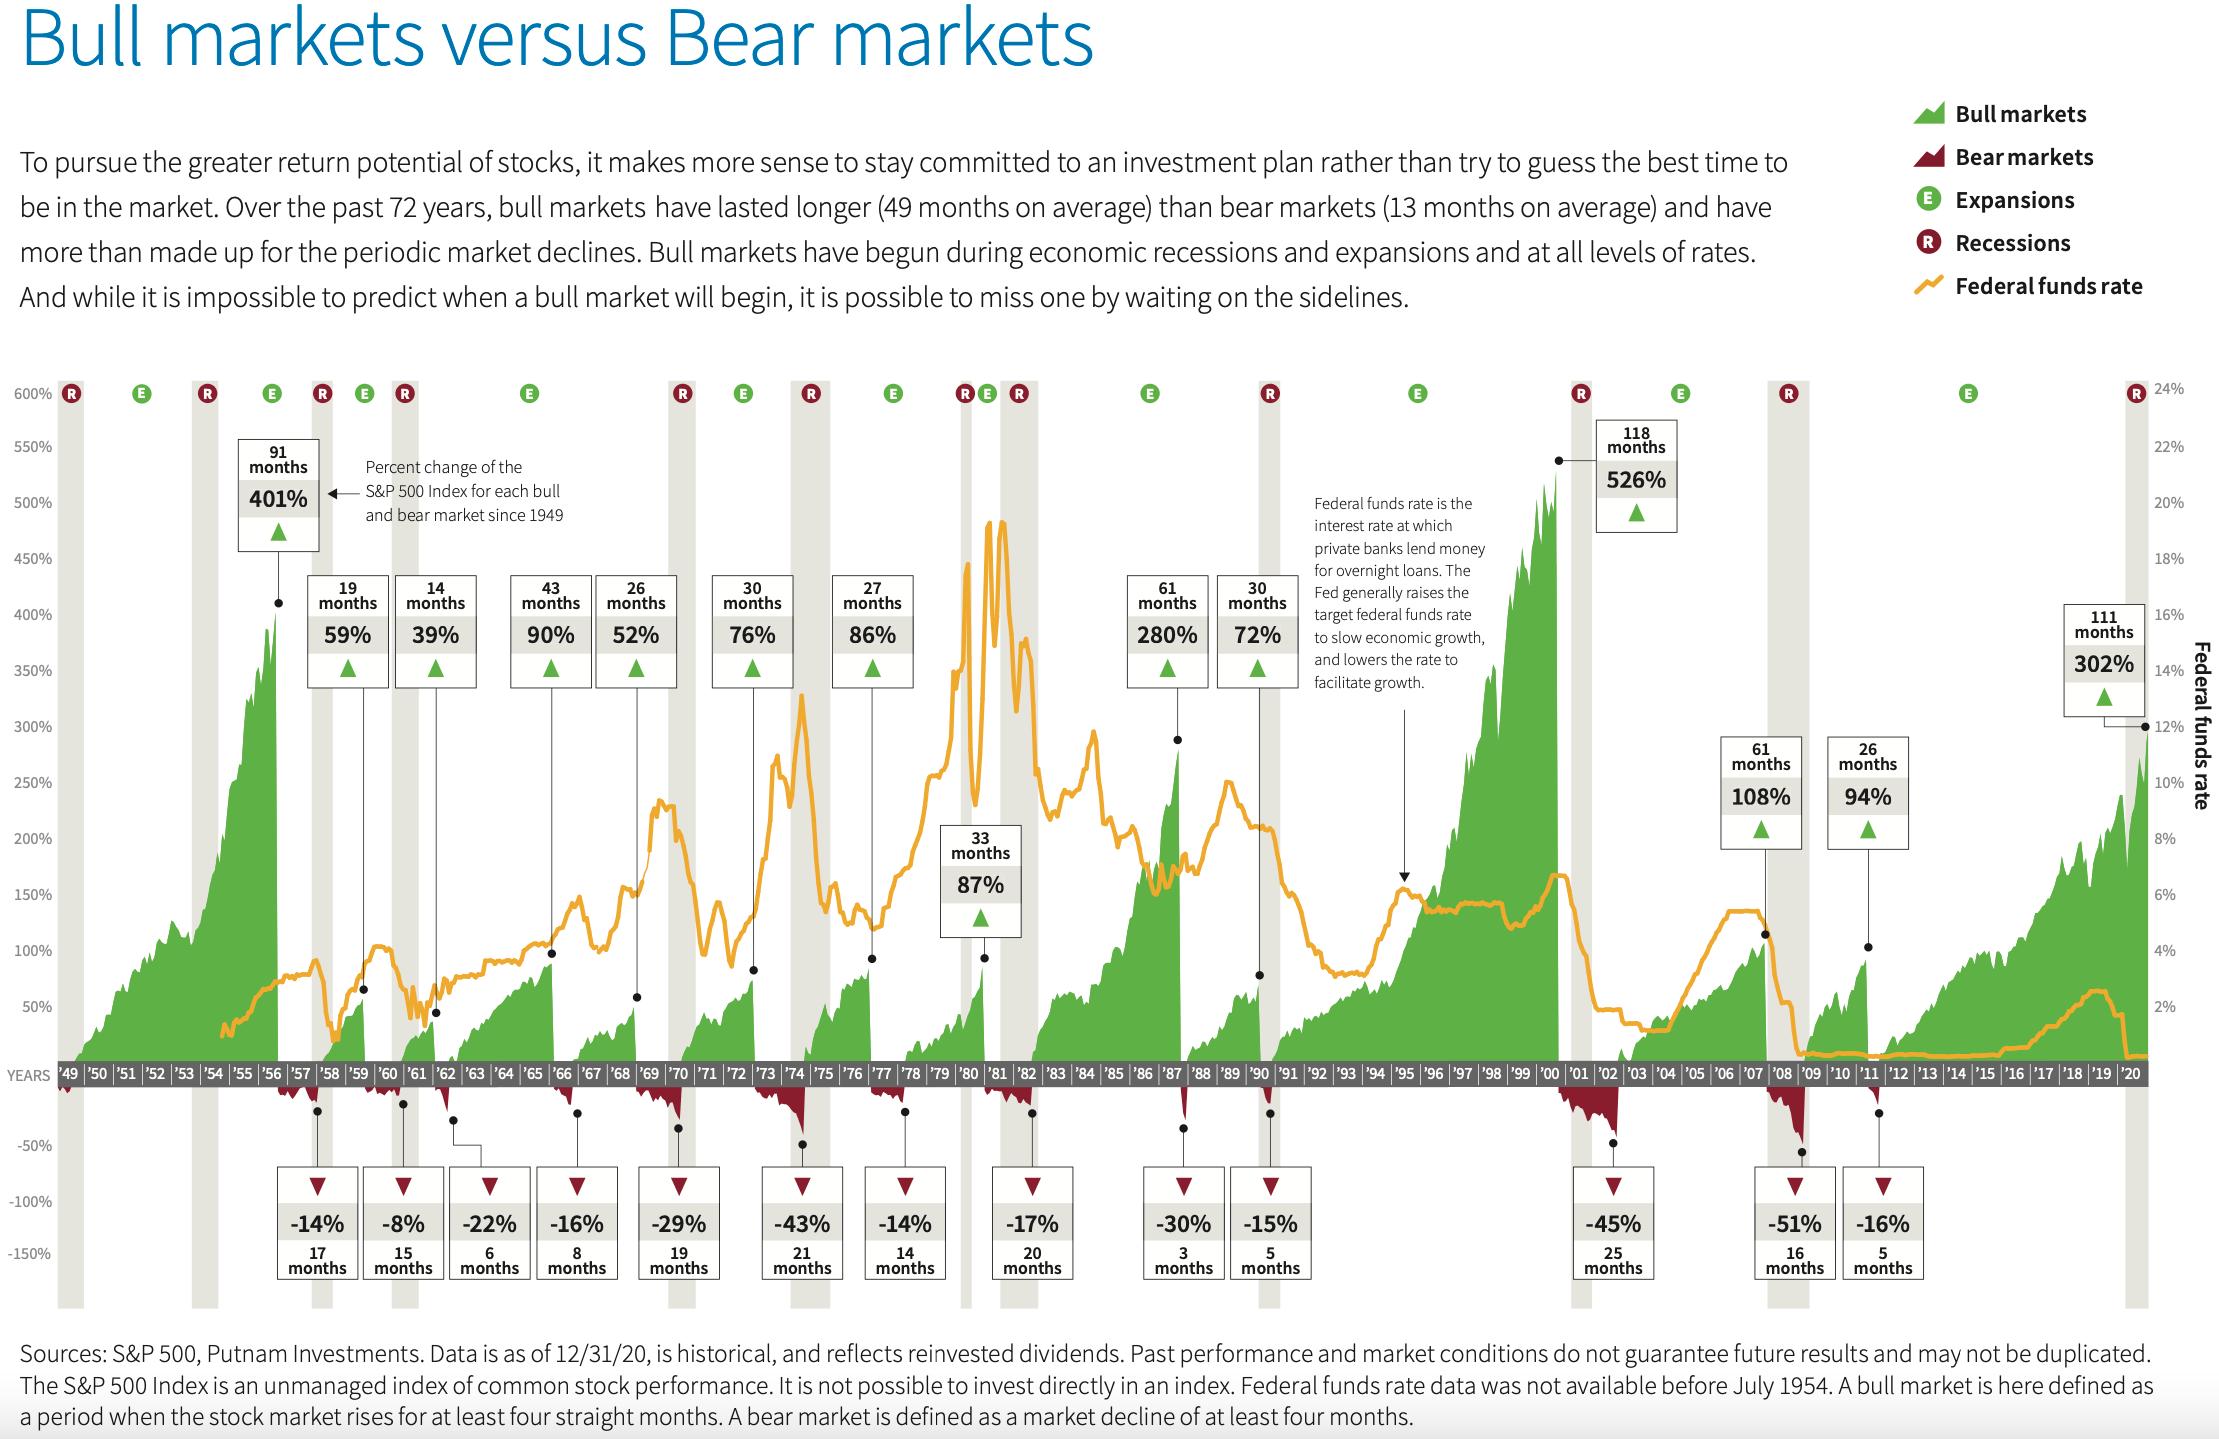 How long do bull markets last? How long do bear markets last? A look at historical bull and bear markets